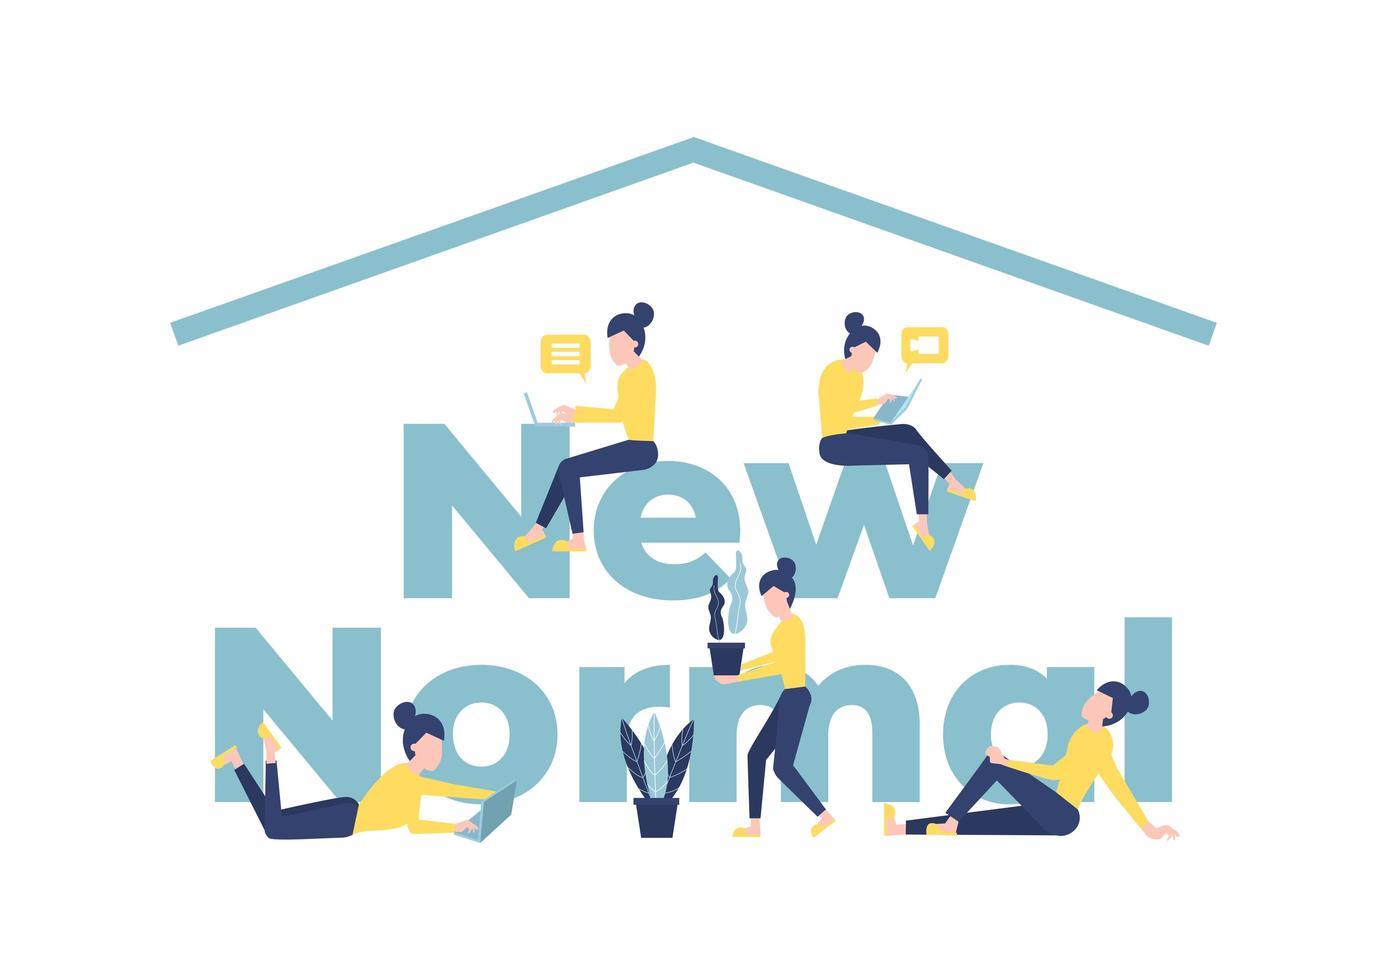 neues normales Lifestyle-Typografie-Konzept vektor